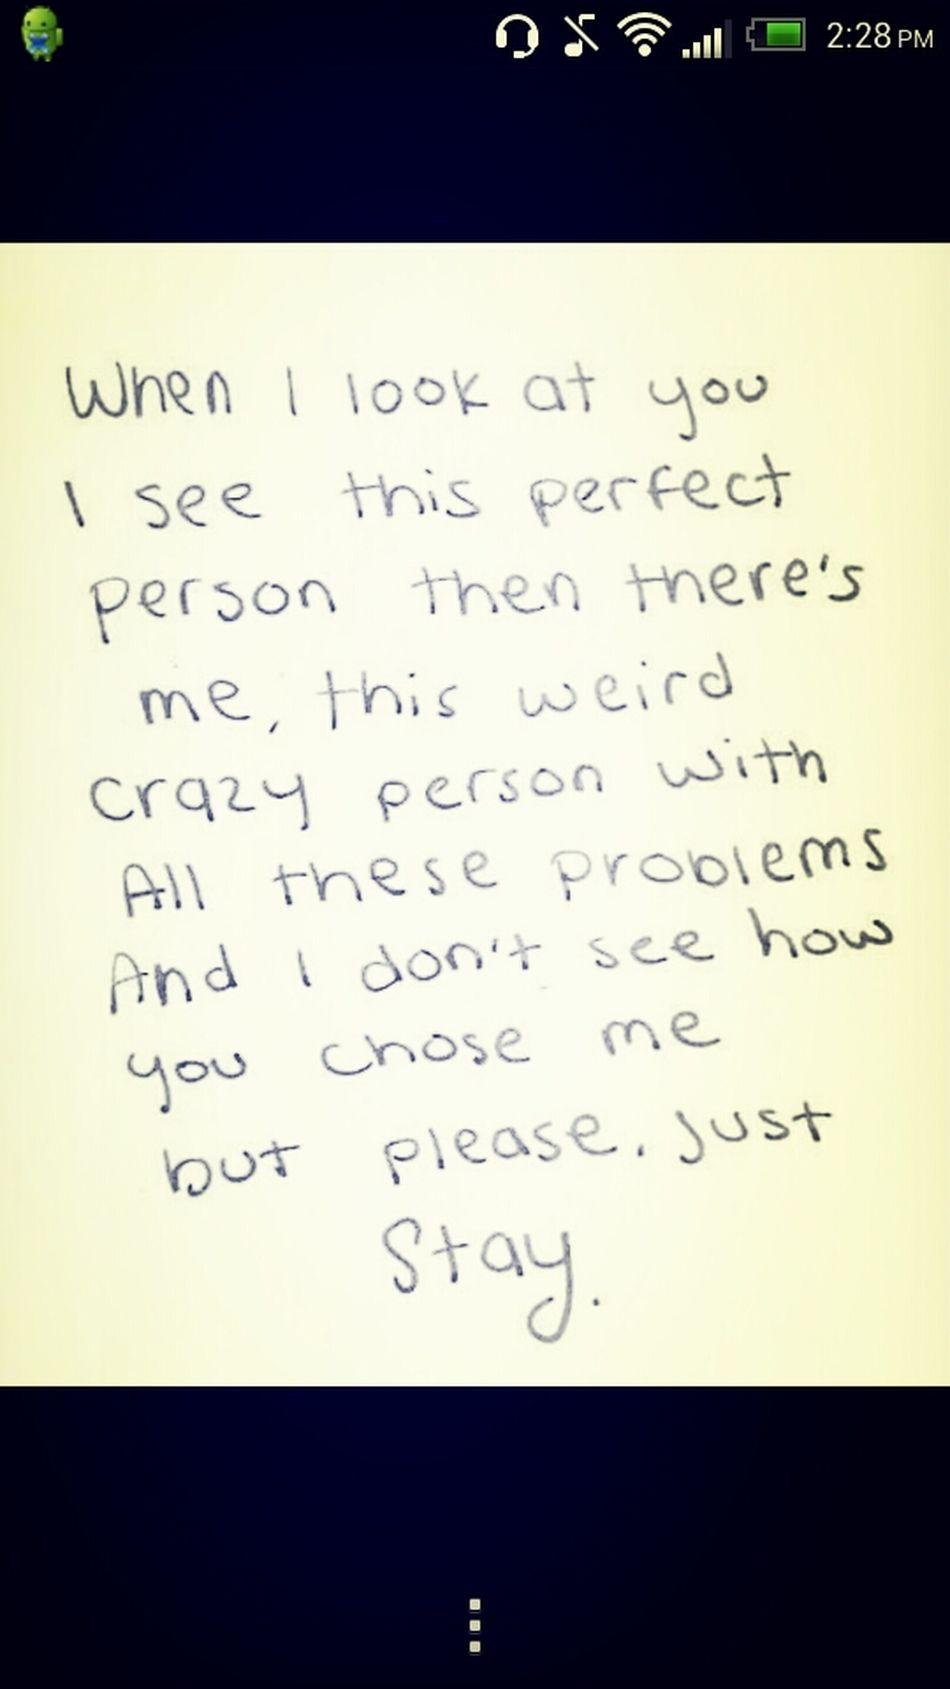 Pleasee.